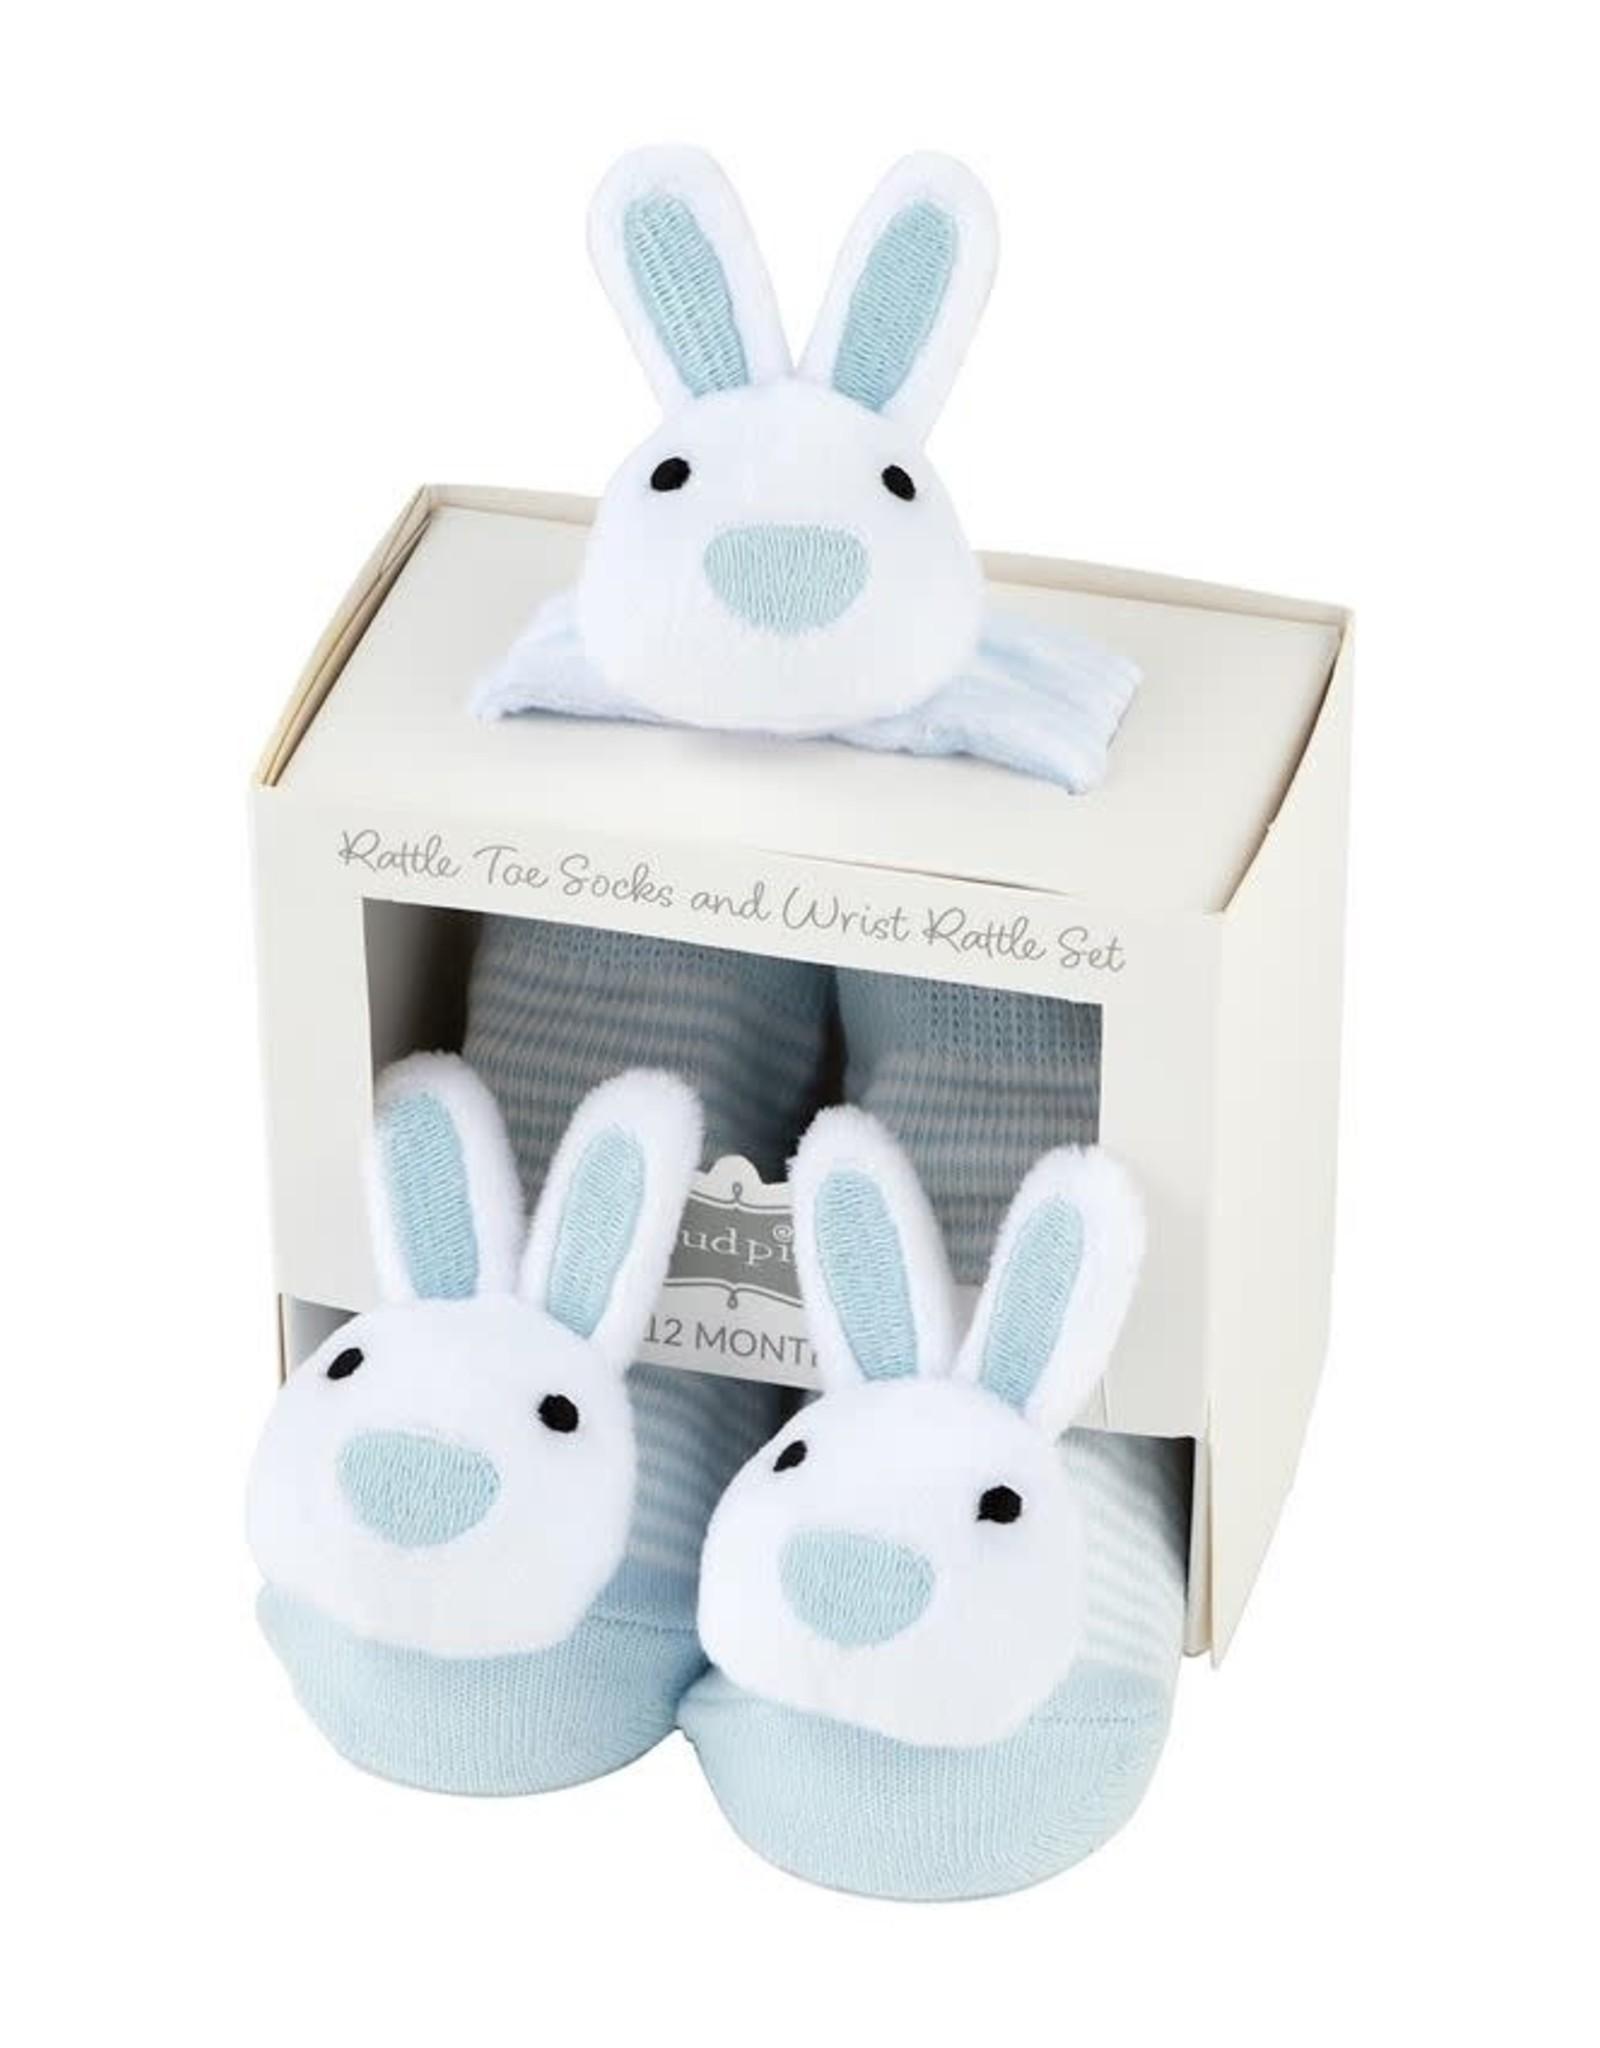 Bunny Wrist Rattle Socks Bl